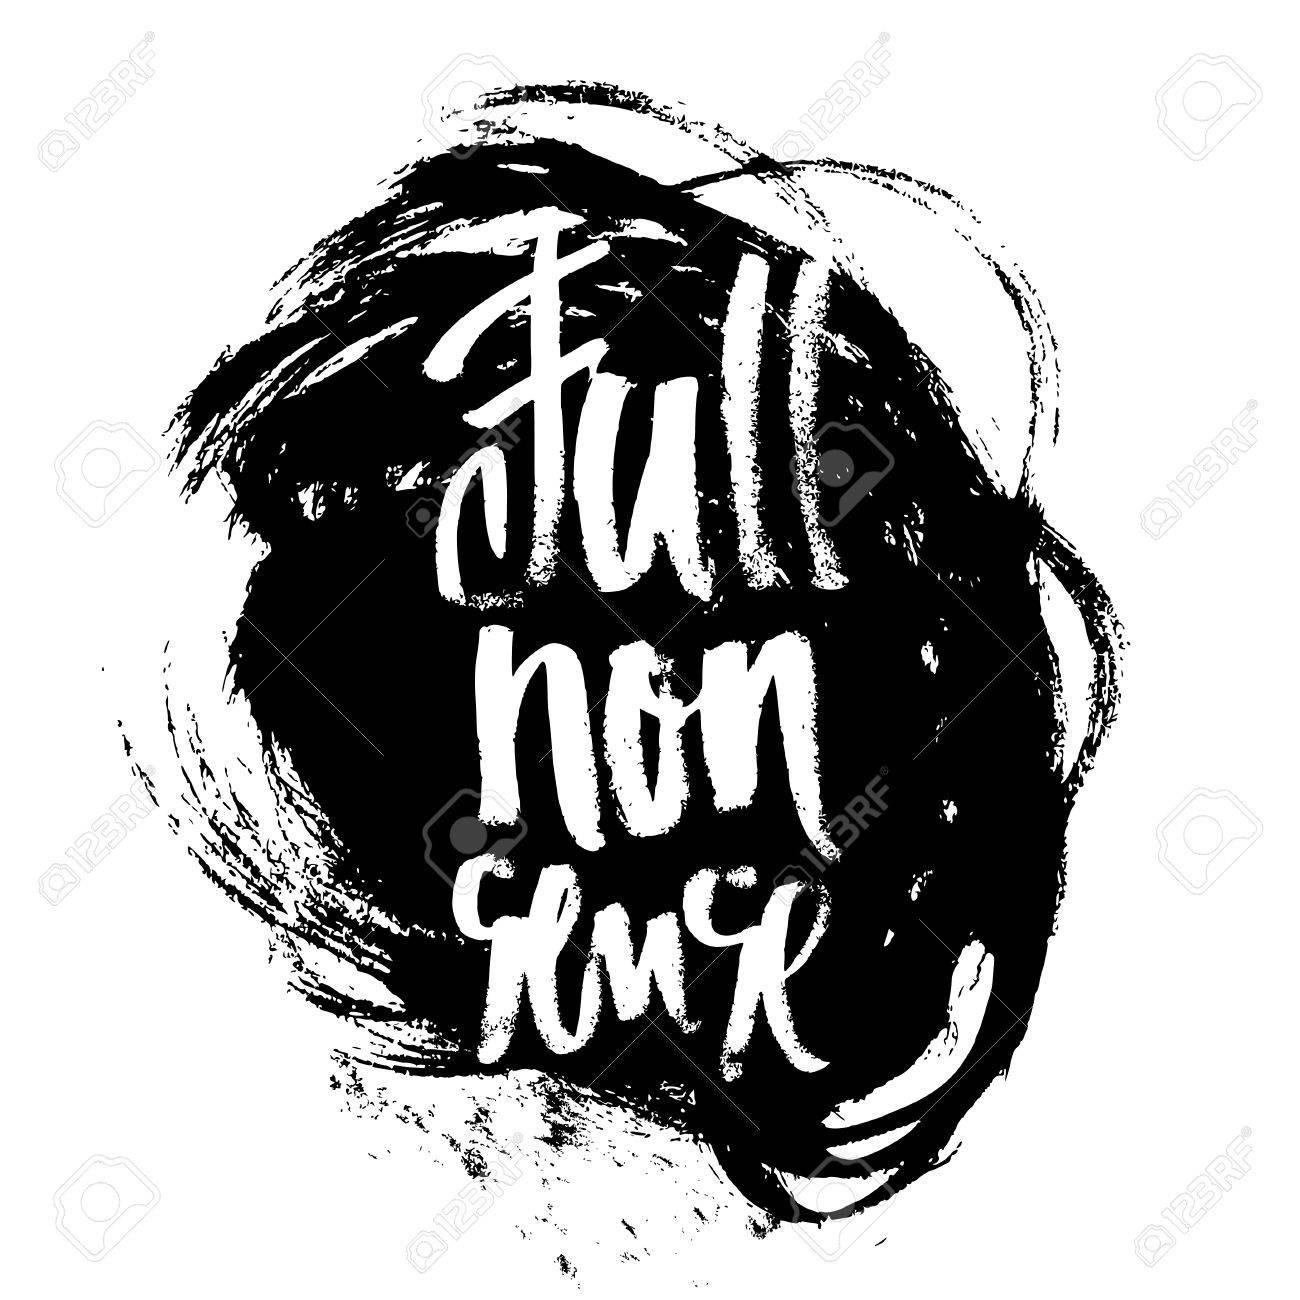 Black t shirt grunge - Full Nonsense T Shirt Black And White Serigraphy Print Grunge Lettering Stock Vector 53327029